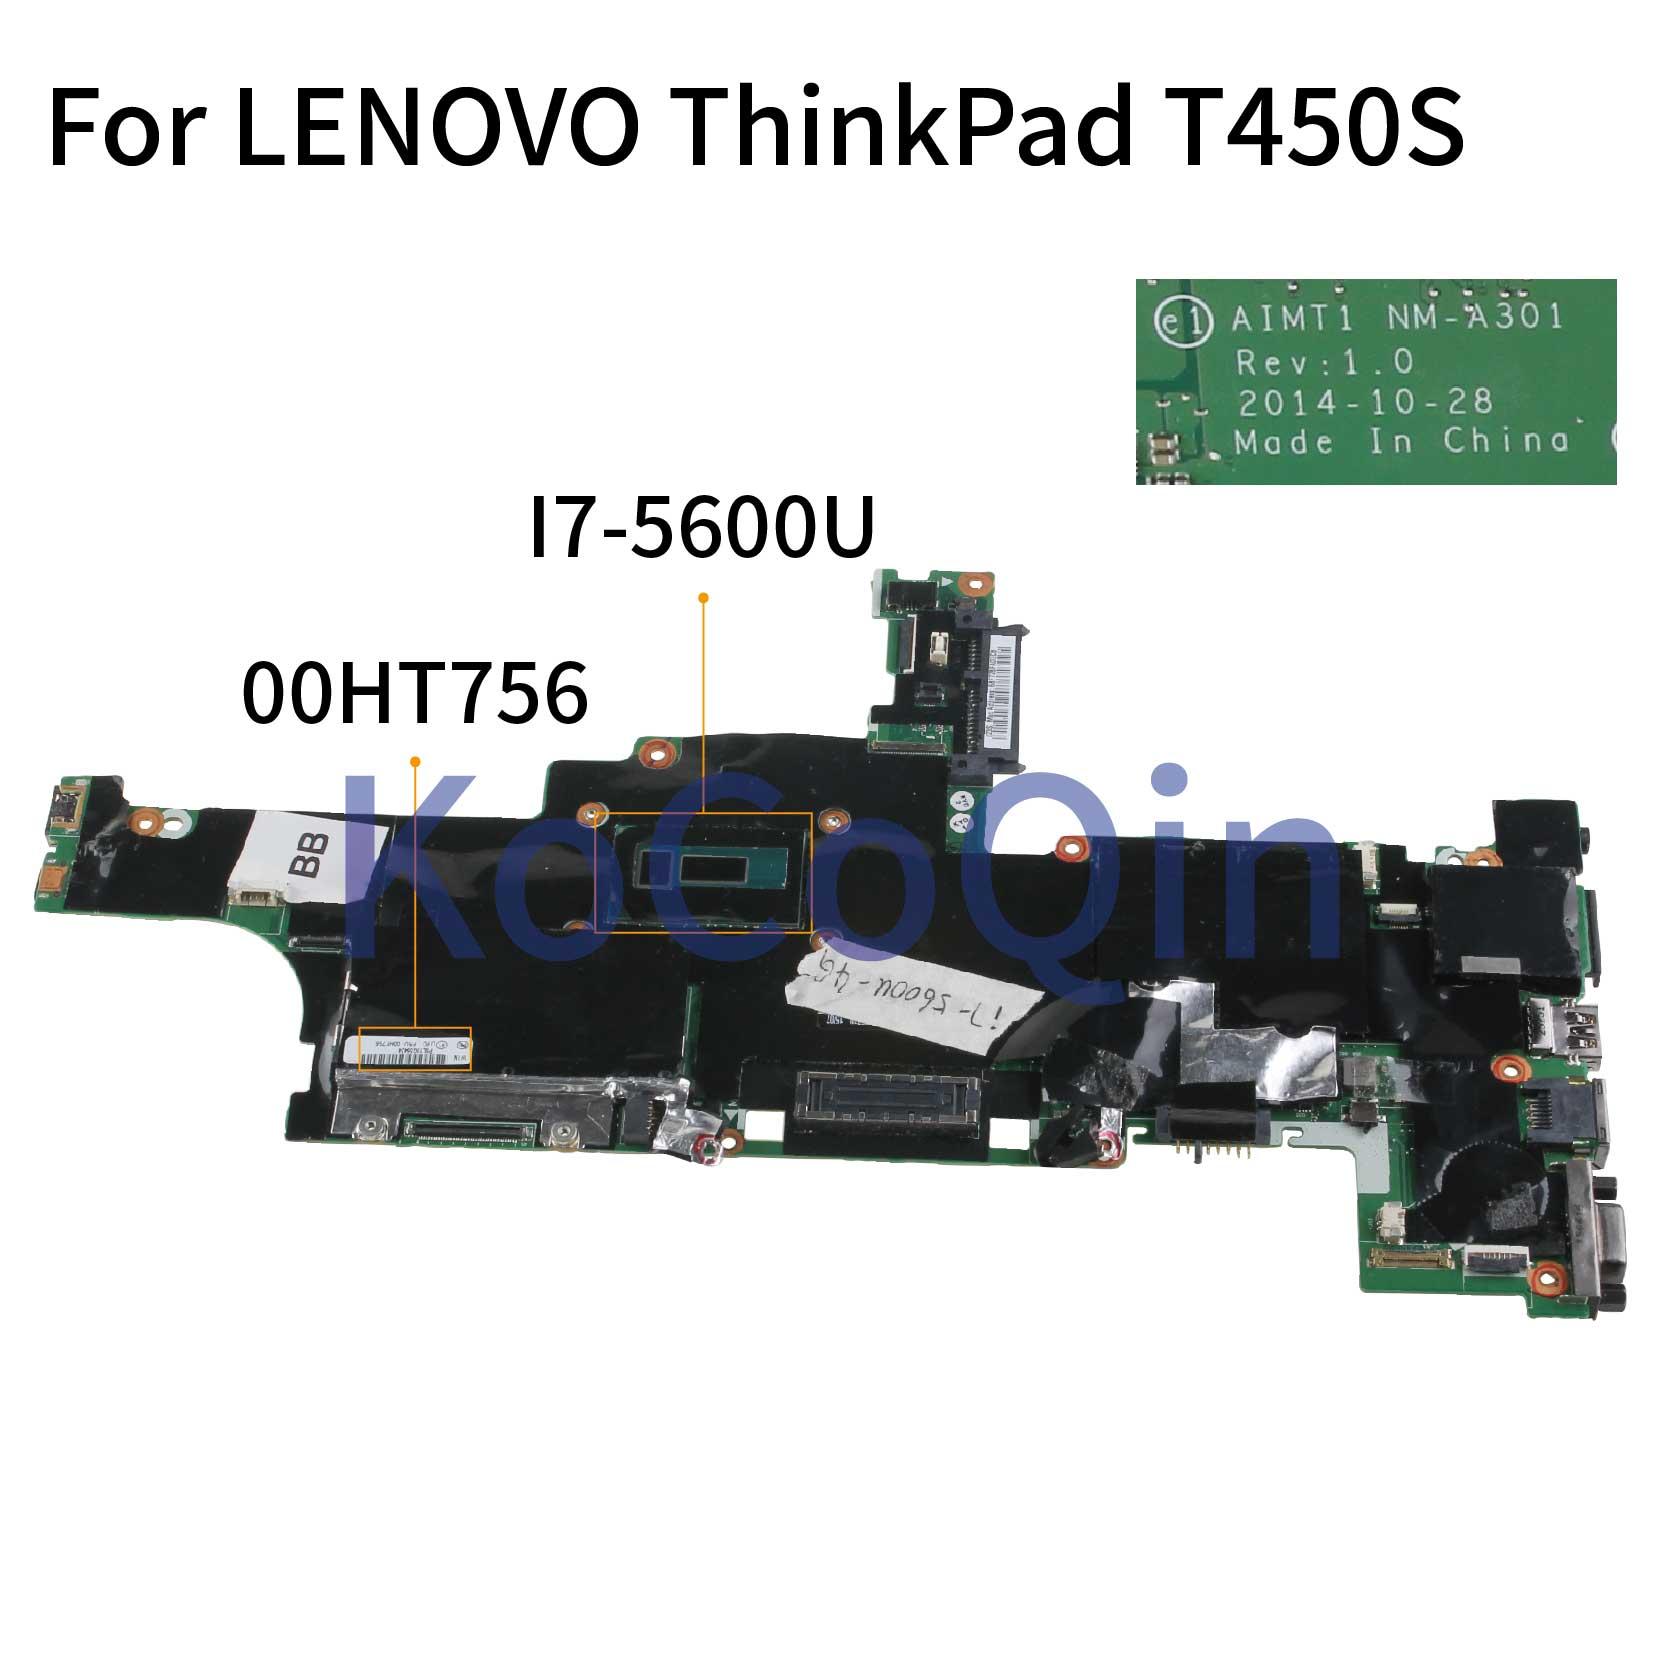 LENOVO ThinkPad T450s MotherBoard i7-5600u FRU 00HT756 NM-A301